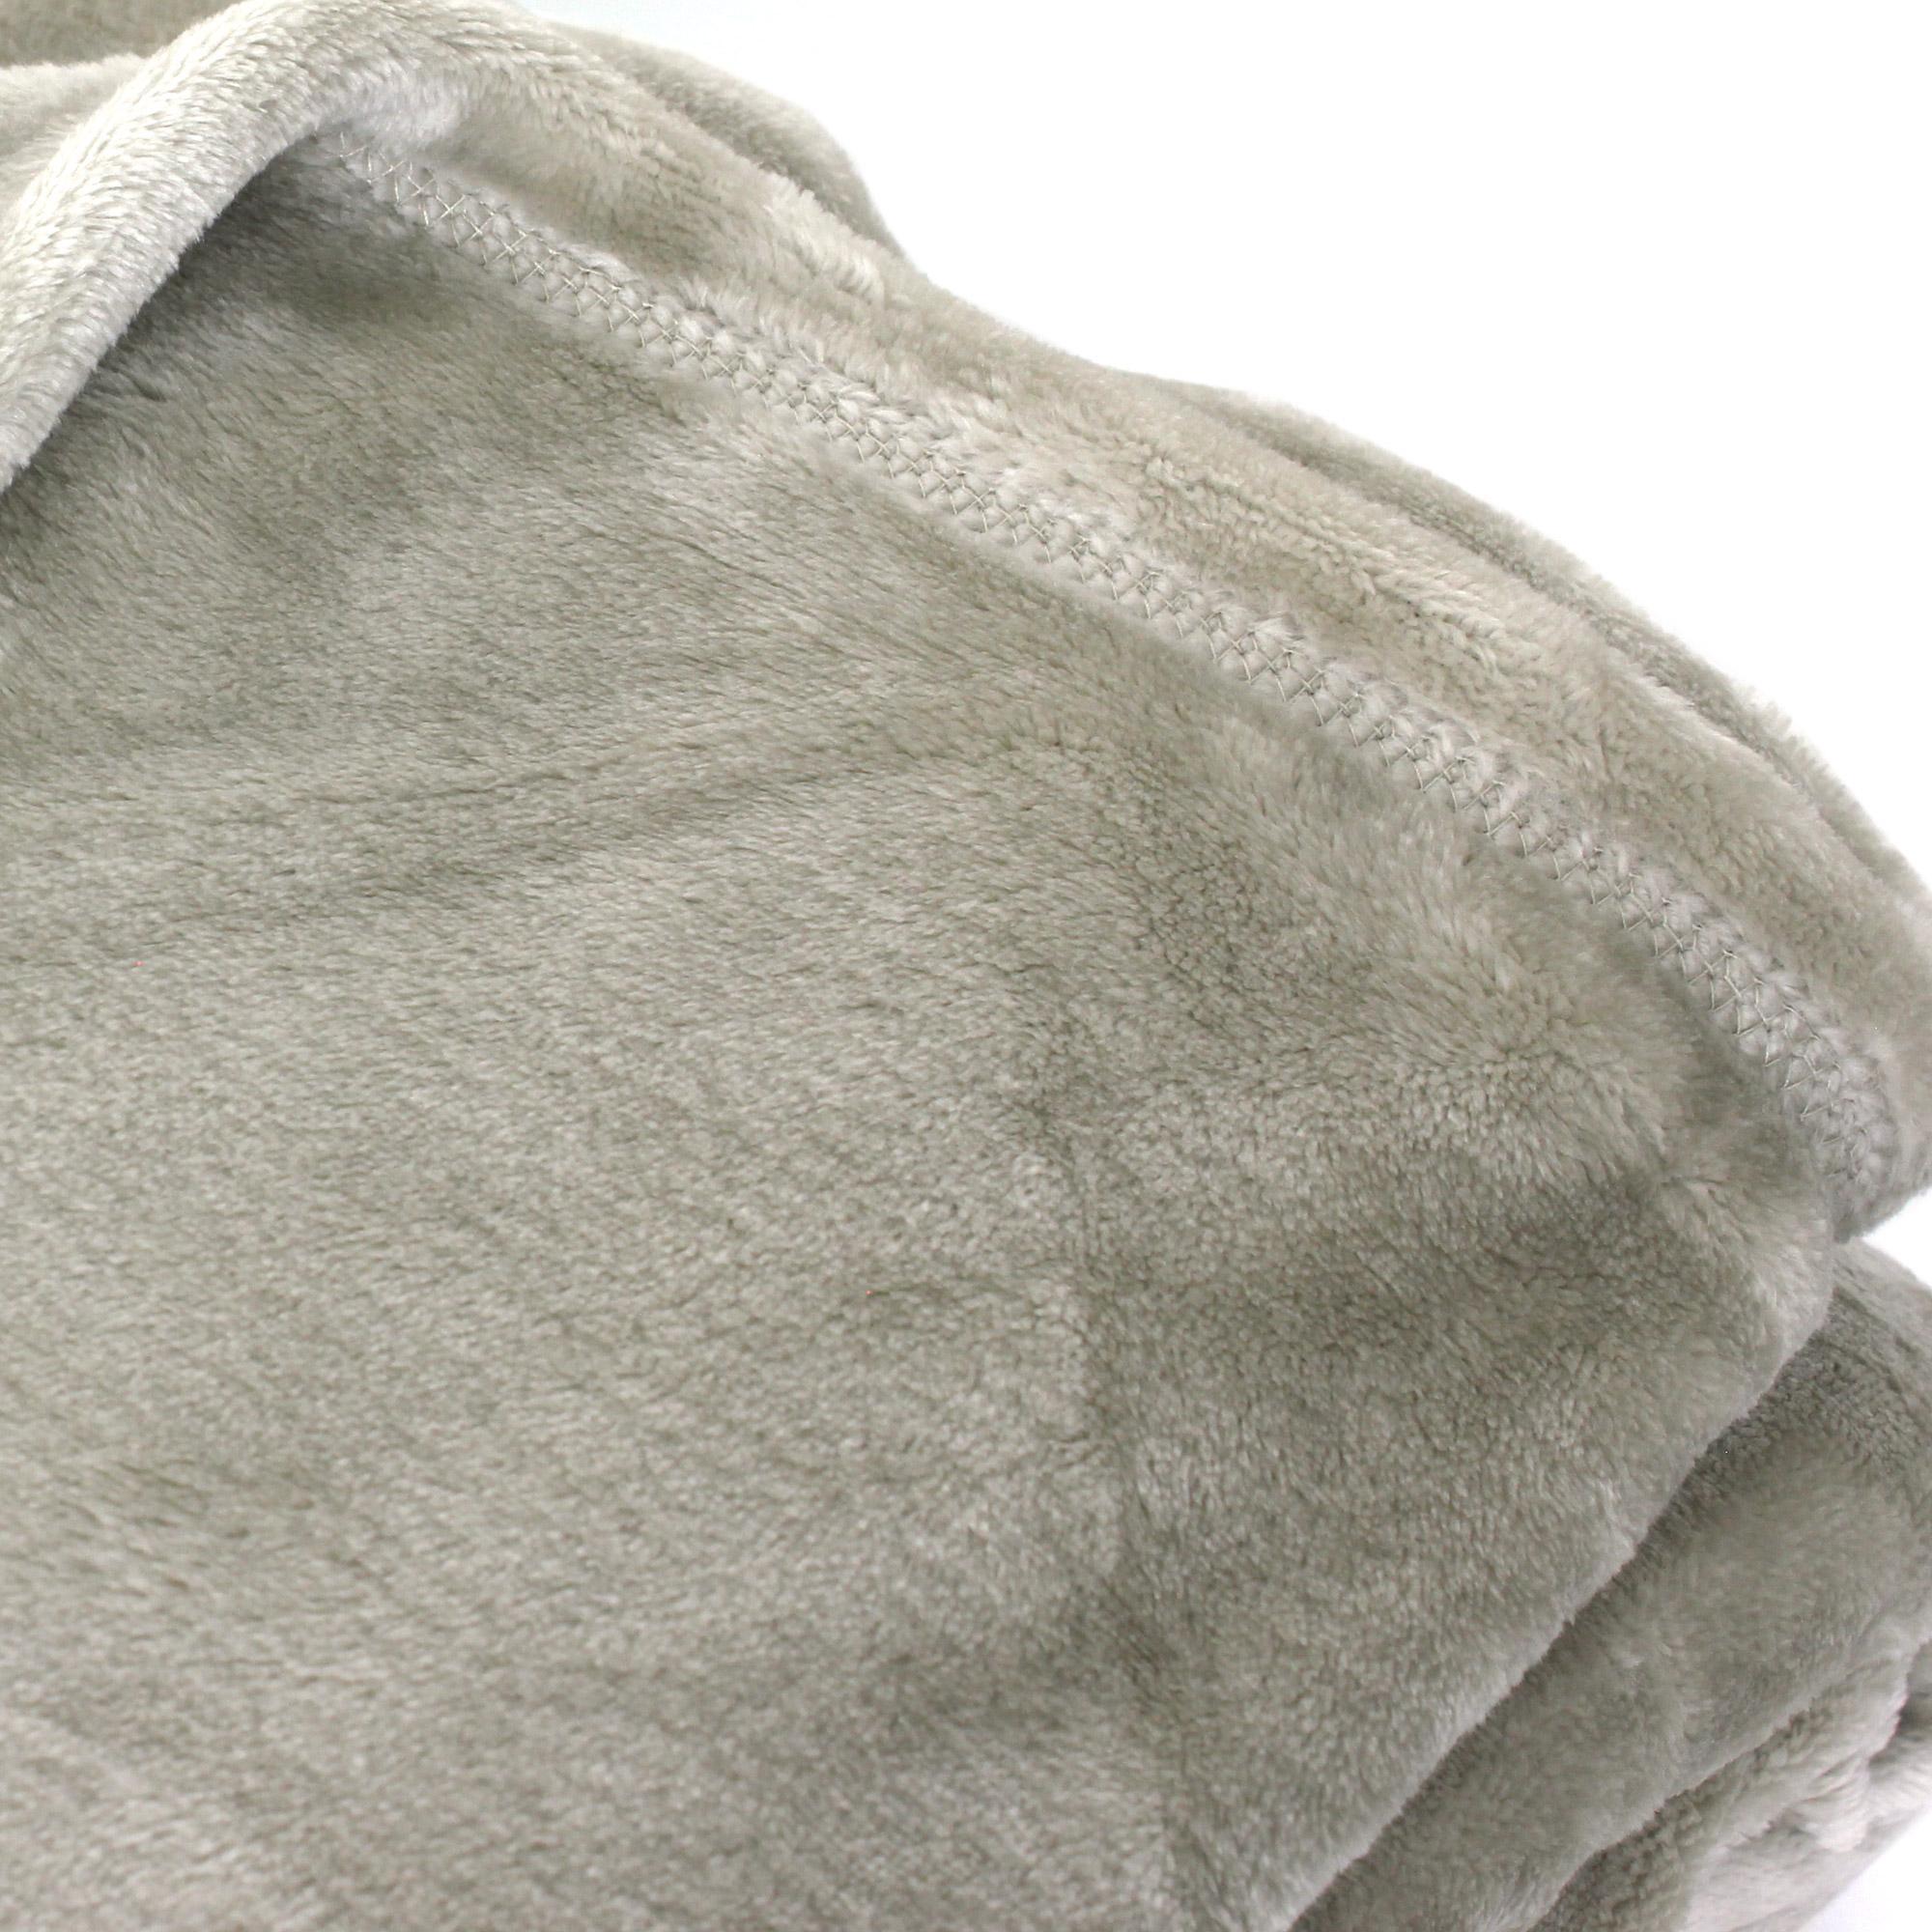 couverture polaire microvelours 220x240 cm velvet galet marron 100 polyester 320 g m2. Black Bedroom Furniture Sets. Home Design Ideas